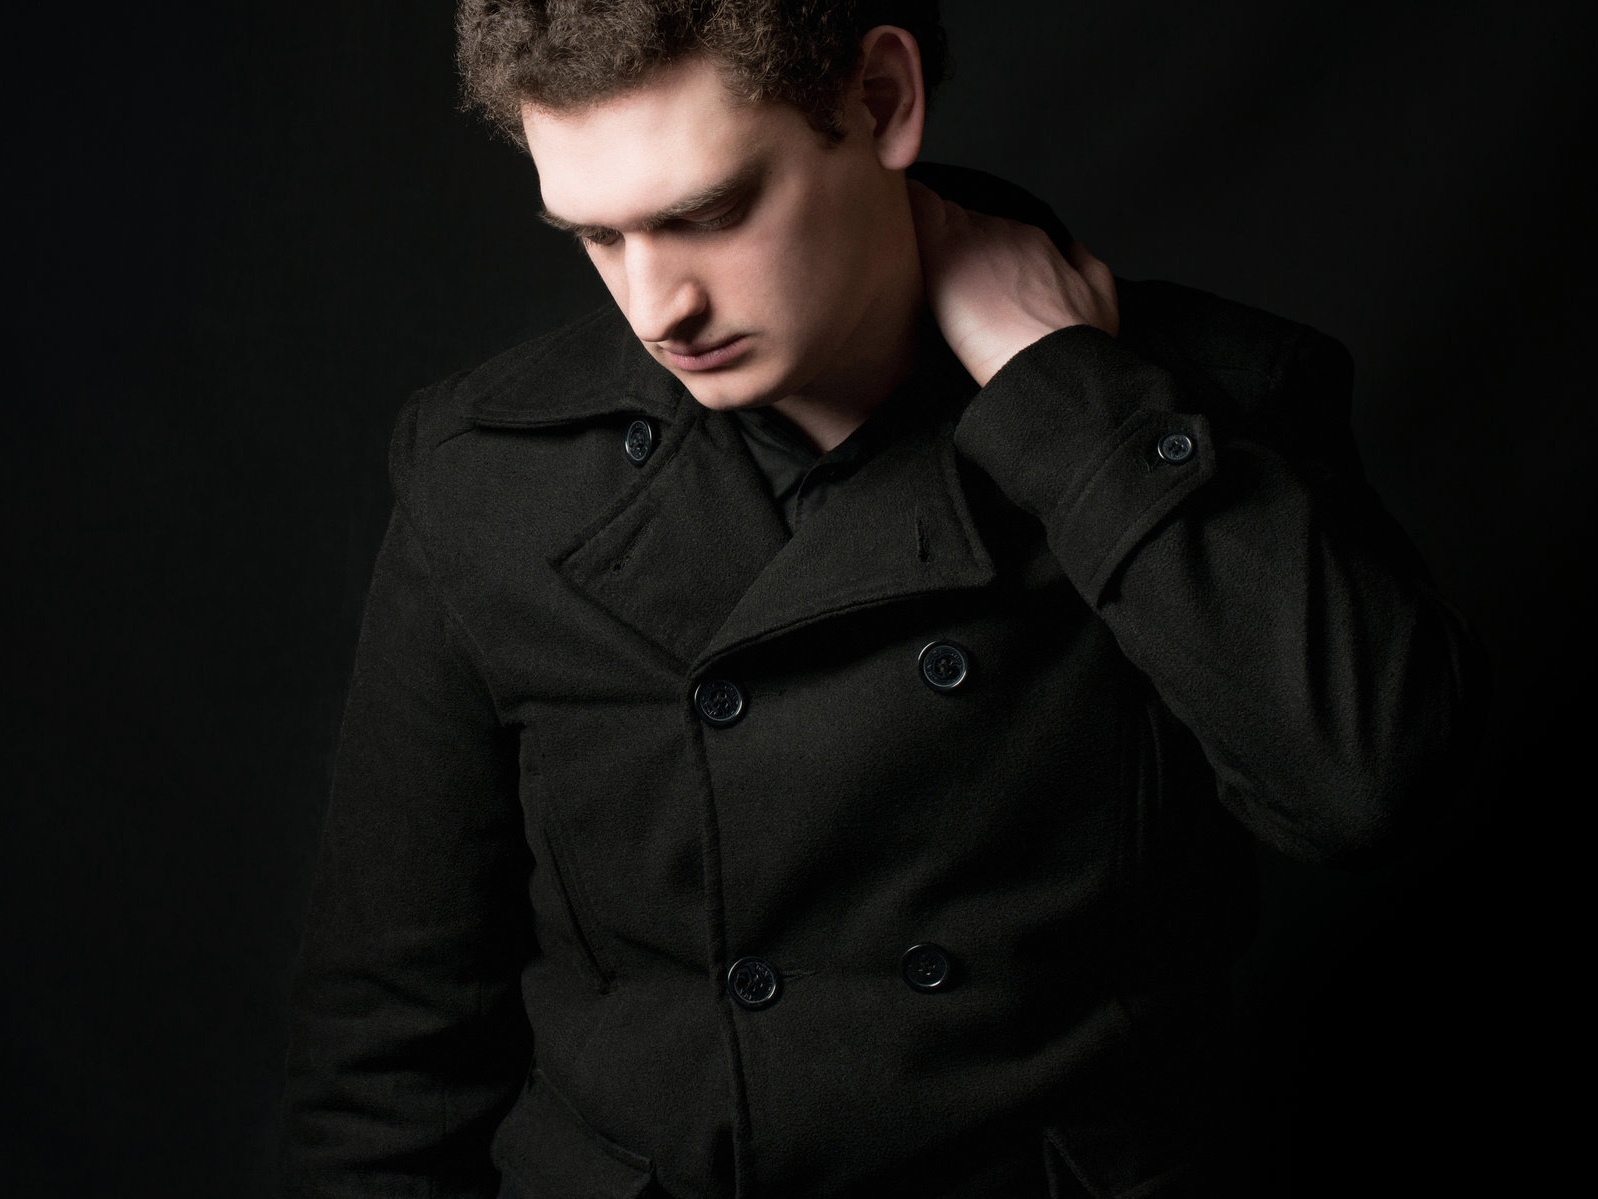 Jason van Wyk - Composer / producer